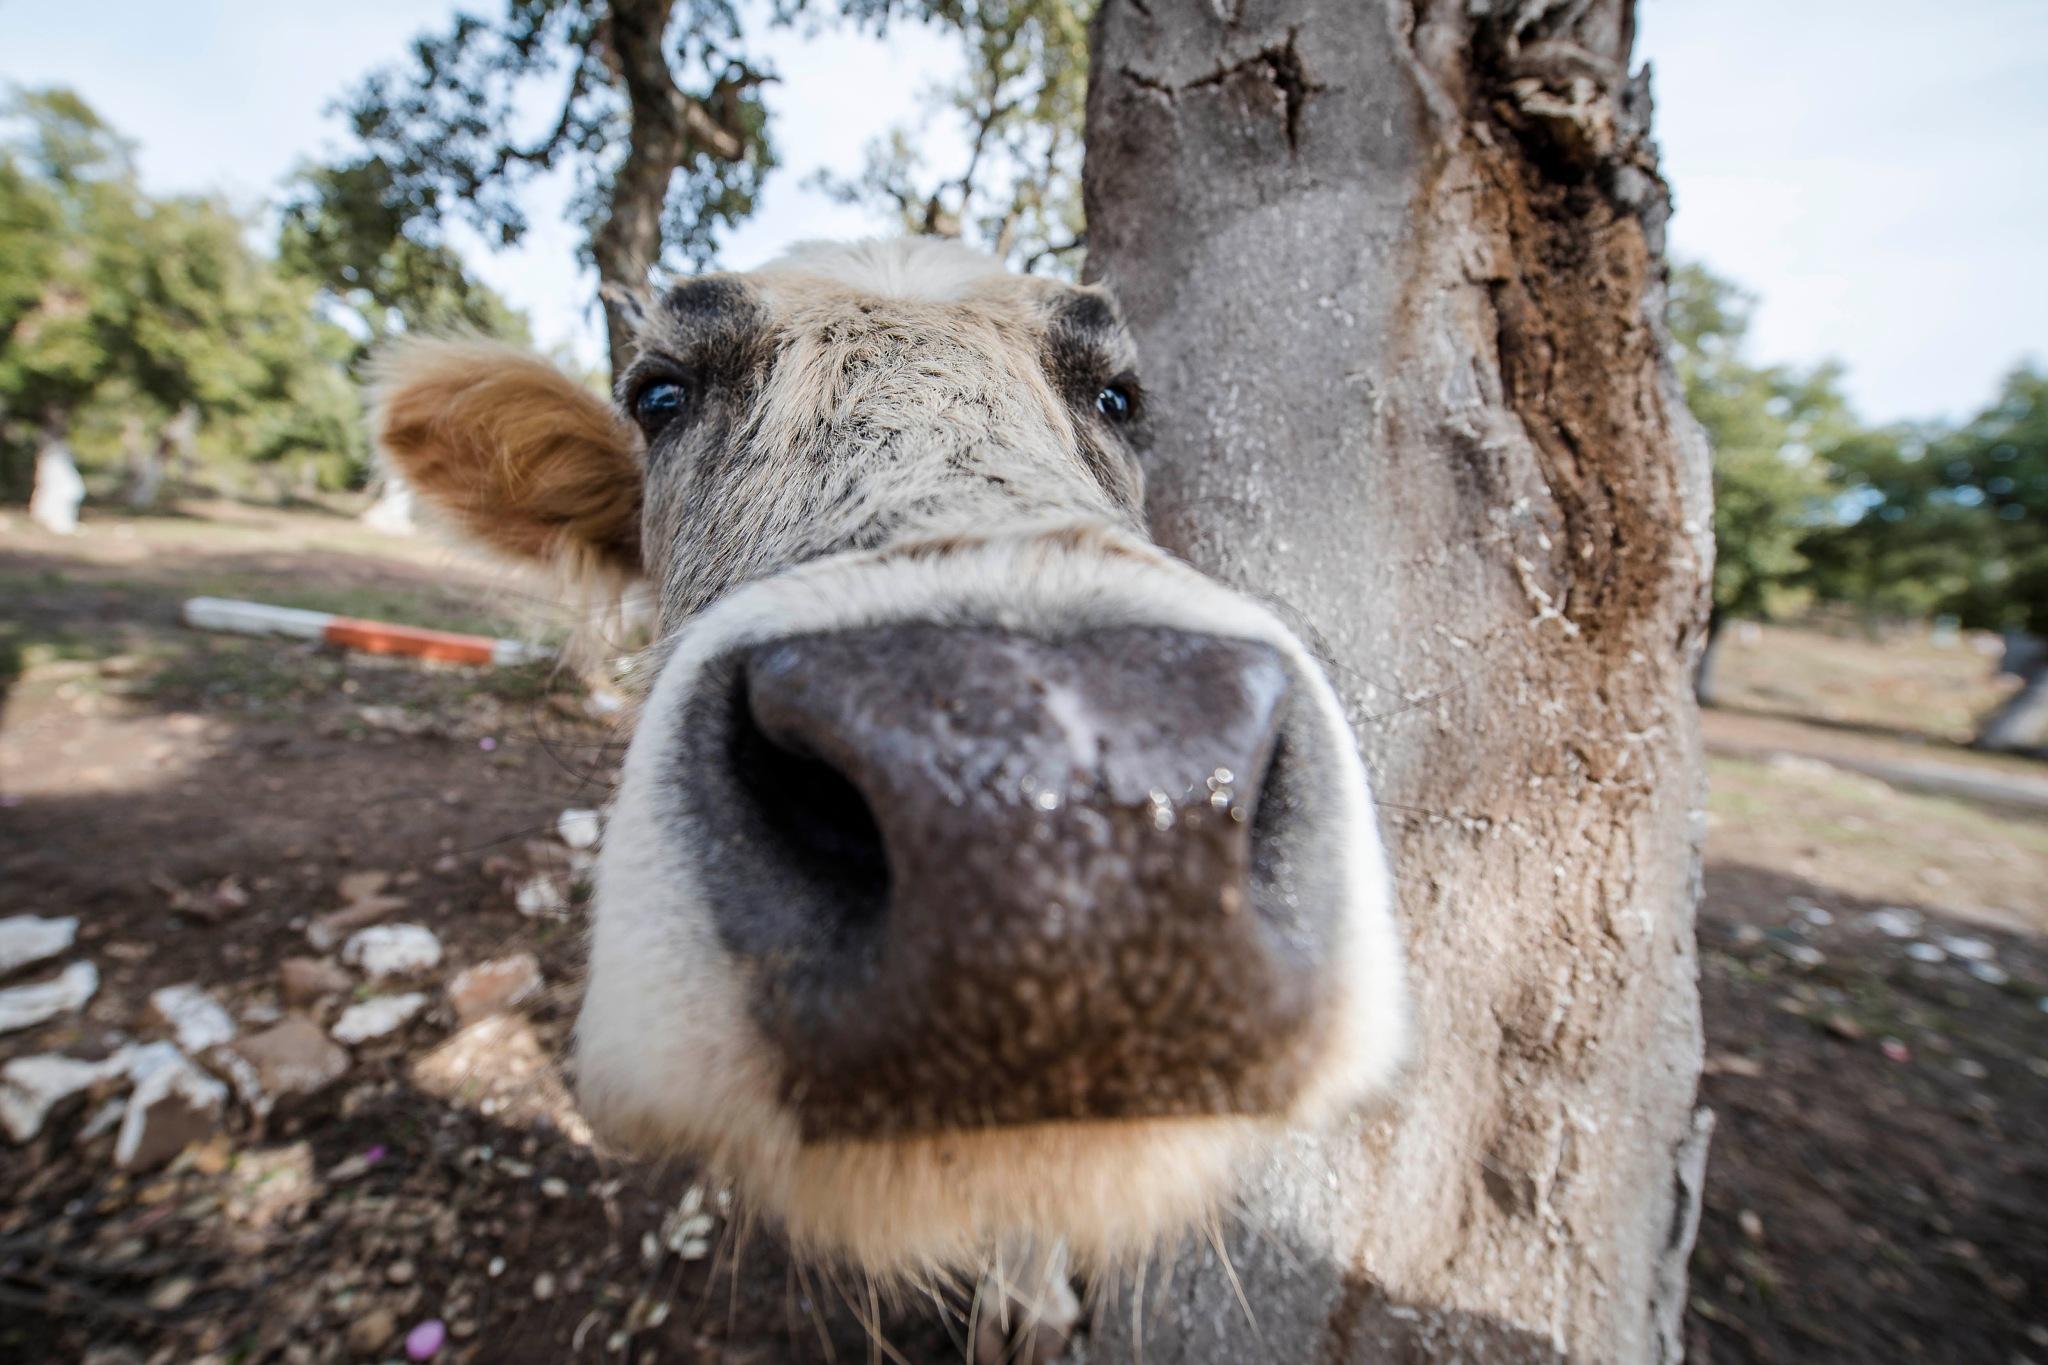 Cow nose by Noureddine Belfethi